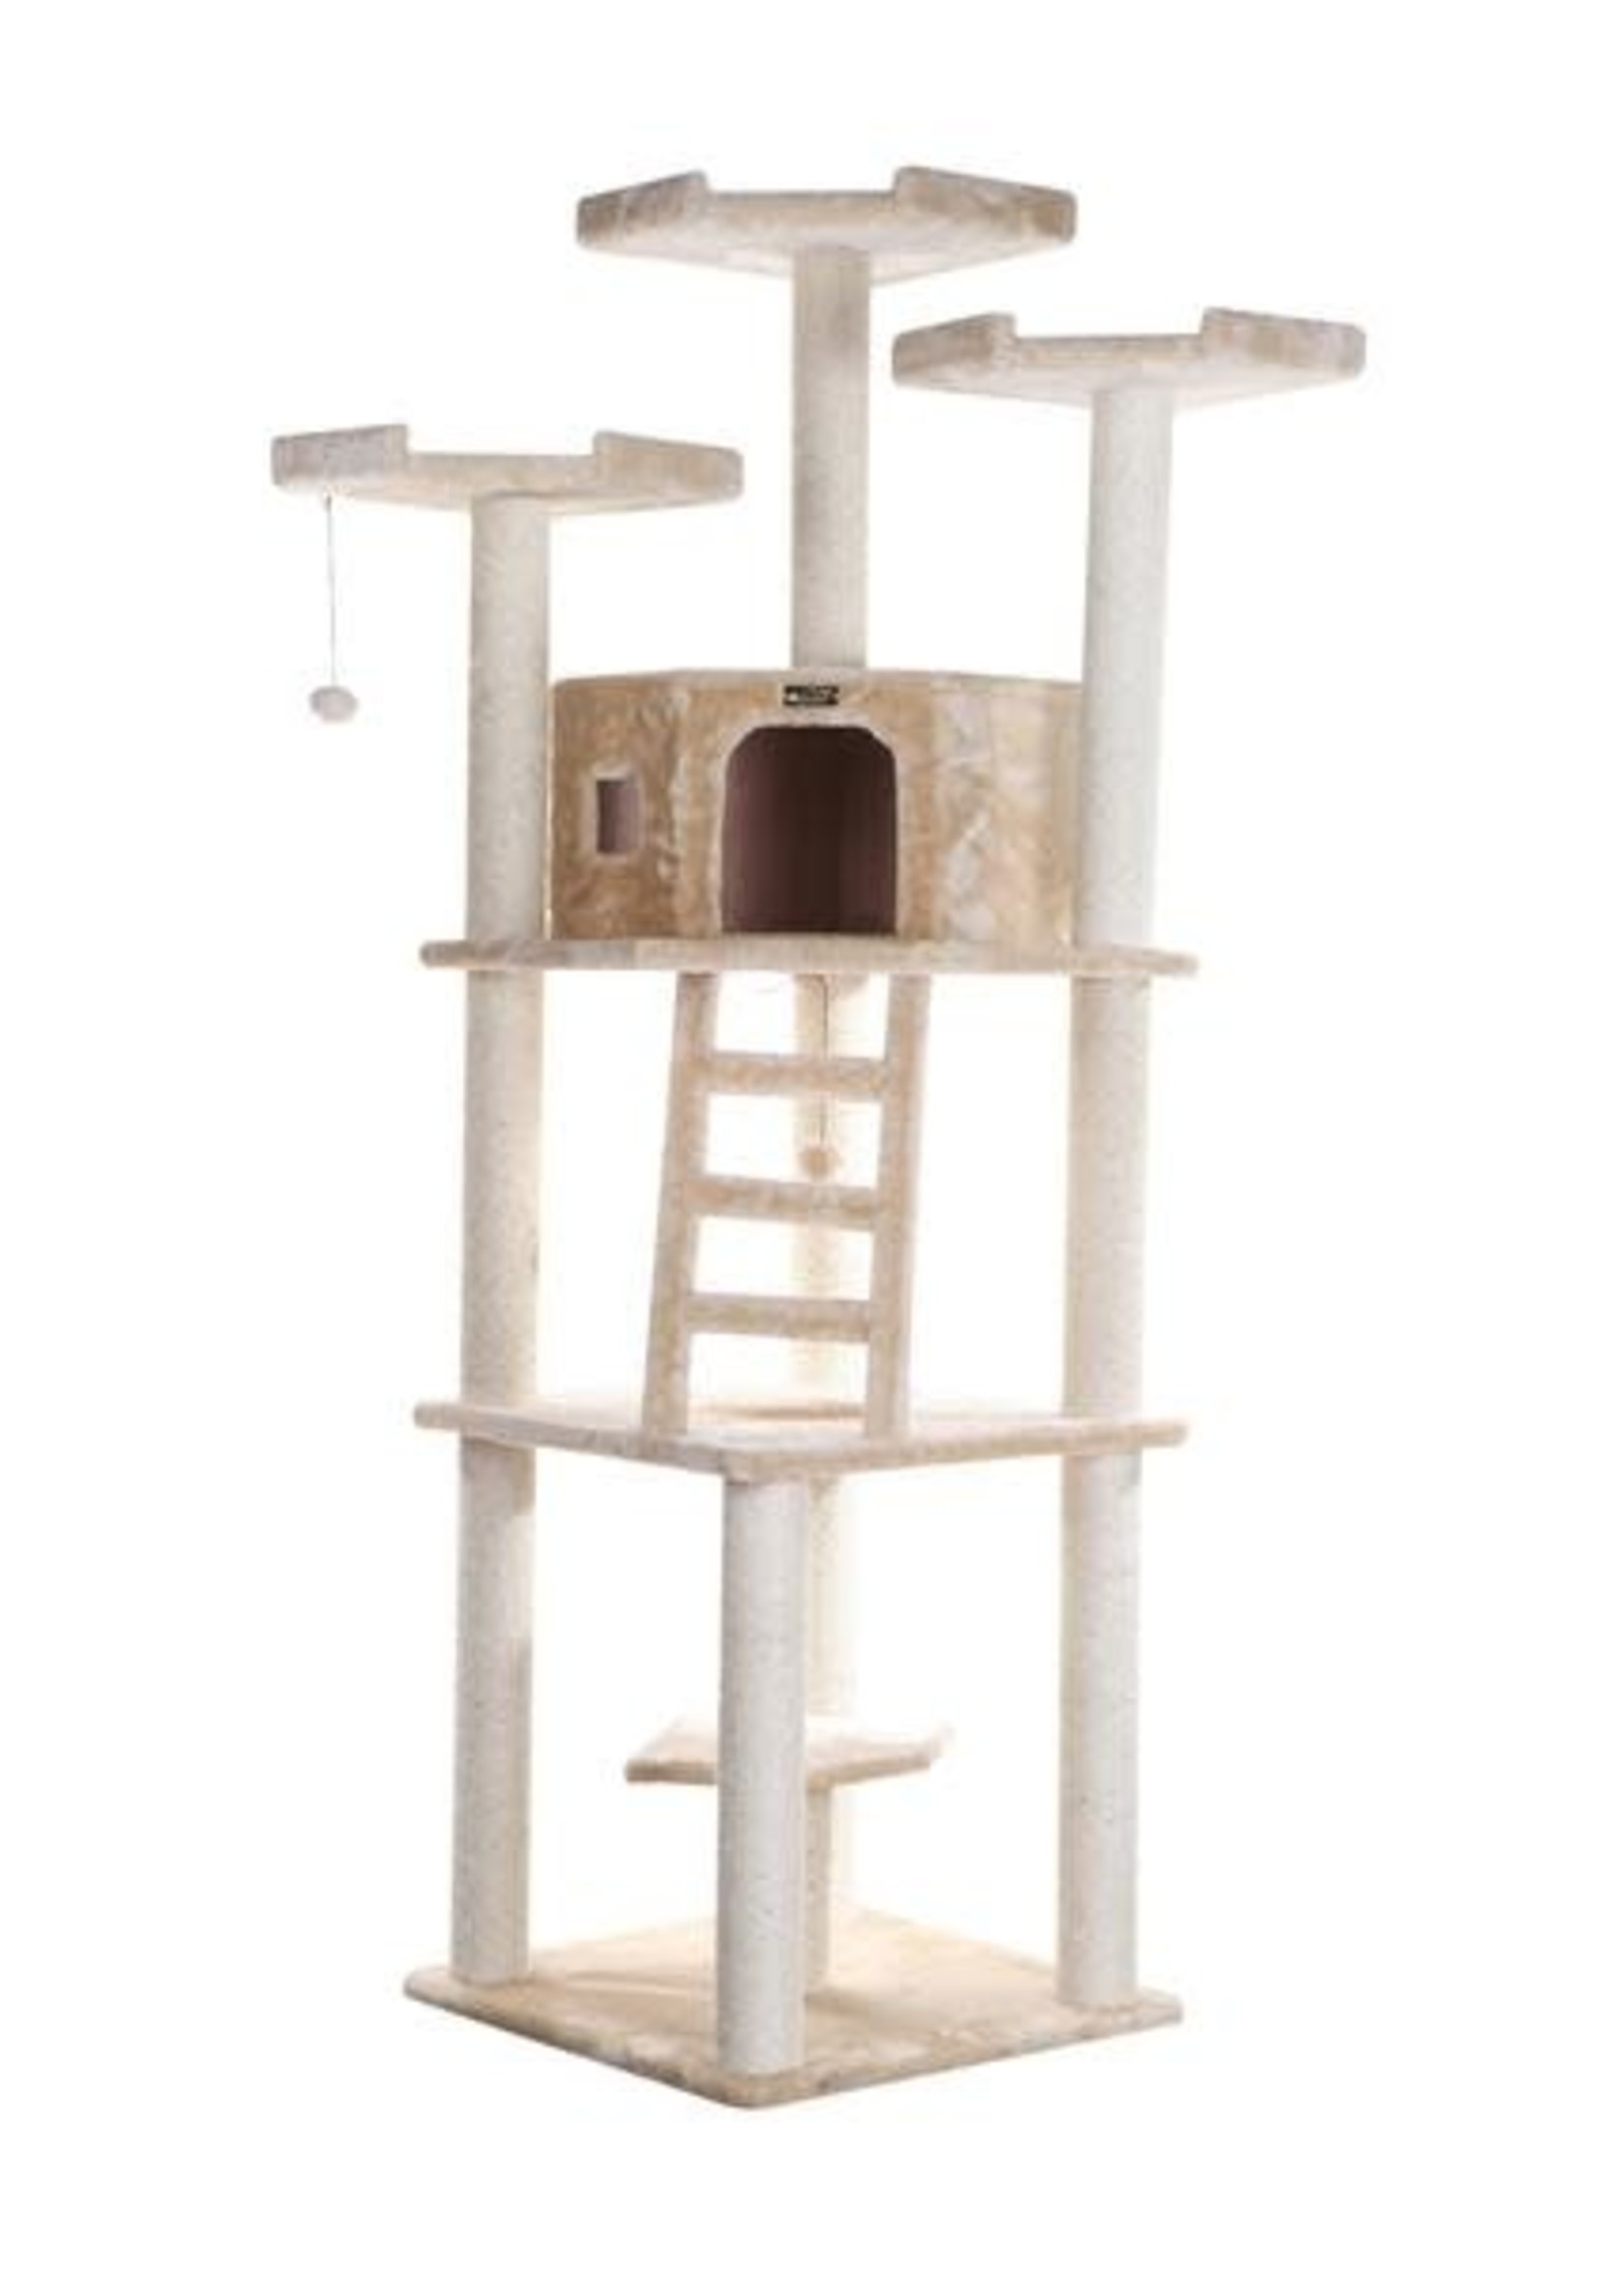 Armarkat Armarkat Multi-Function Cat Tower w/Condo & Perches Beige